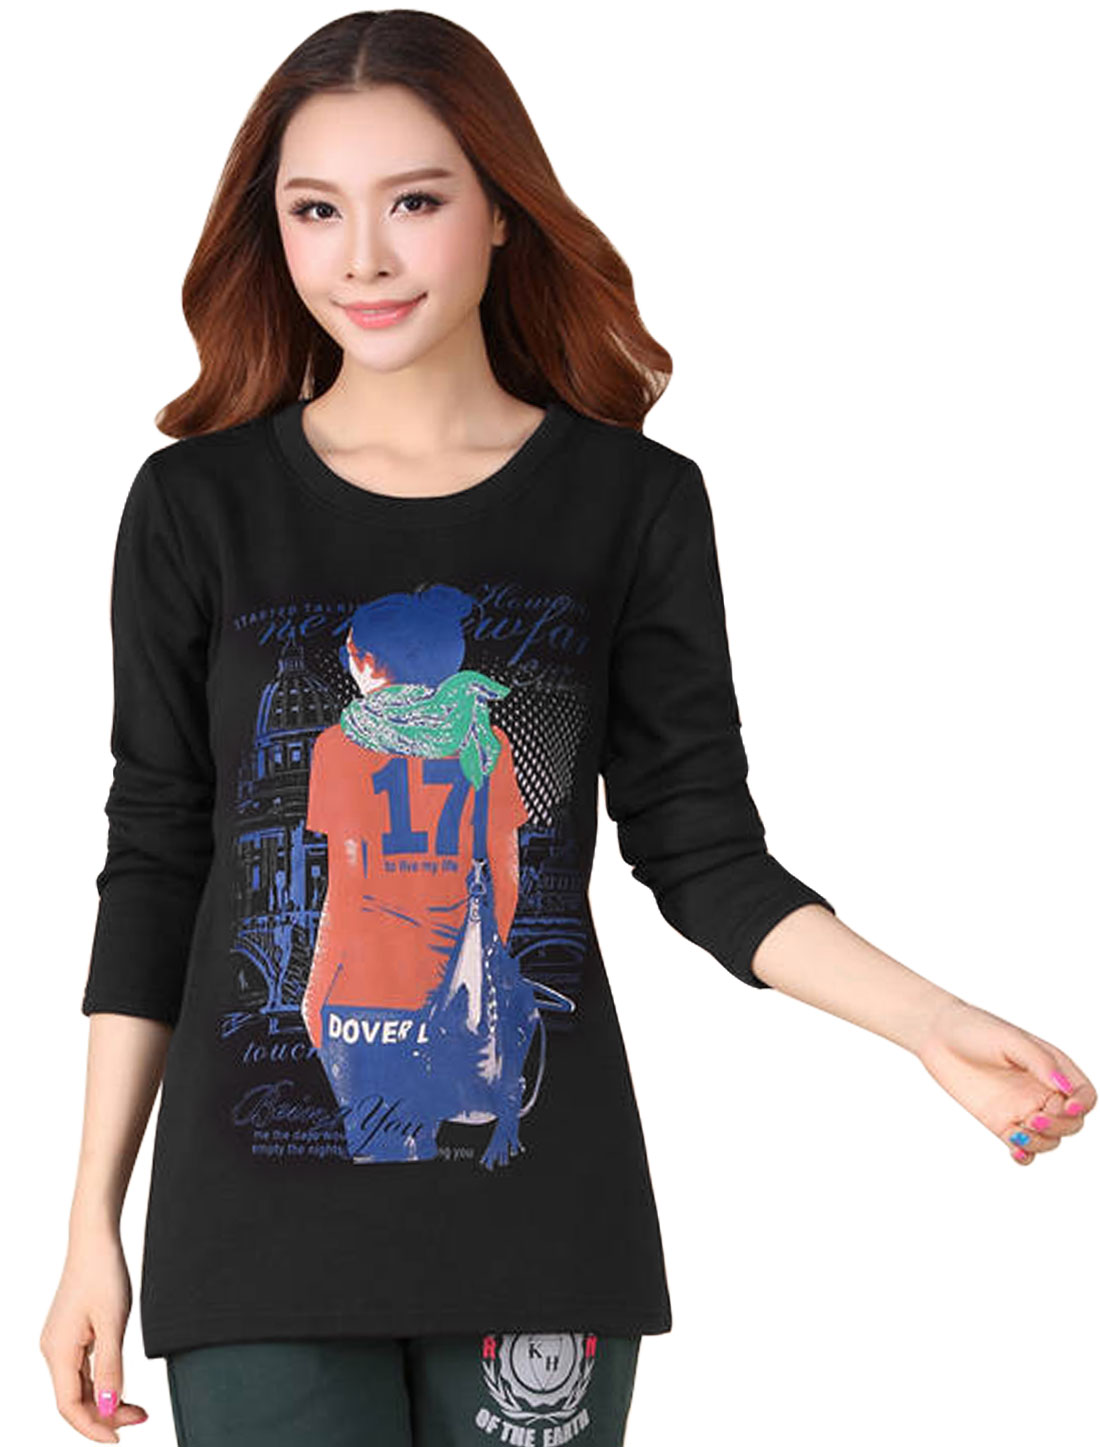 Ladies Black Pullover Portrait Prints Fleece Lining T-Shirt XS